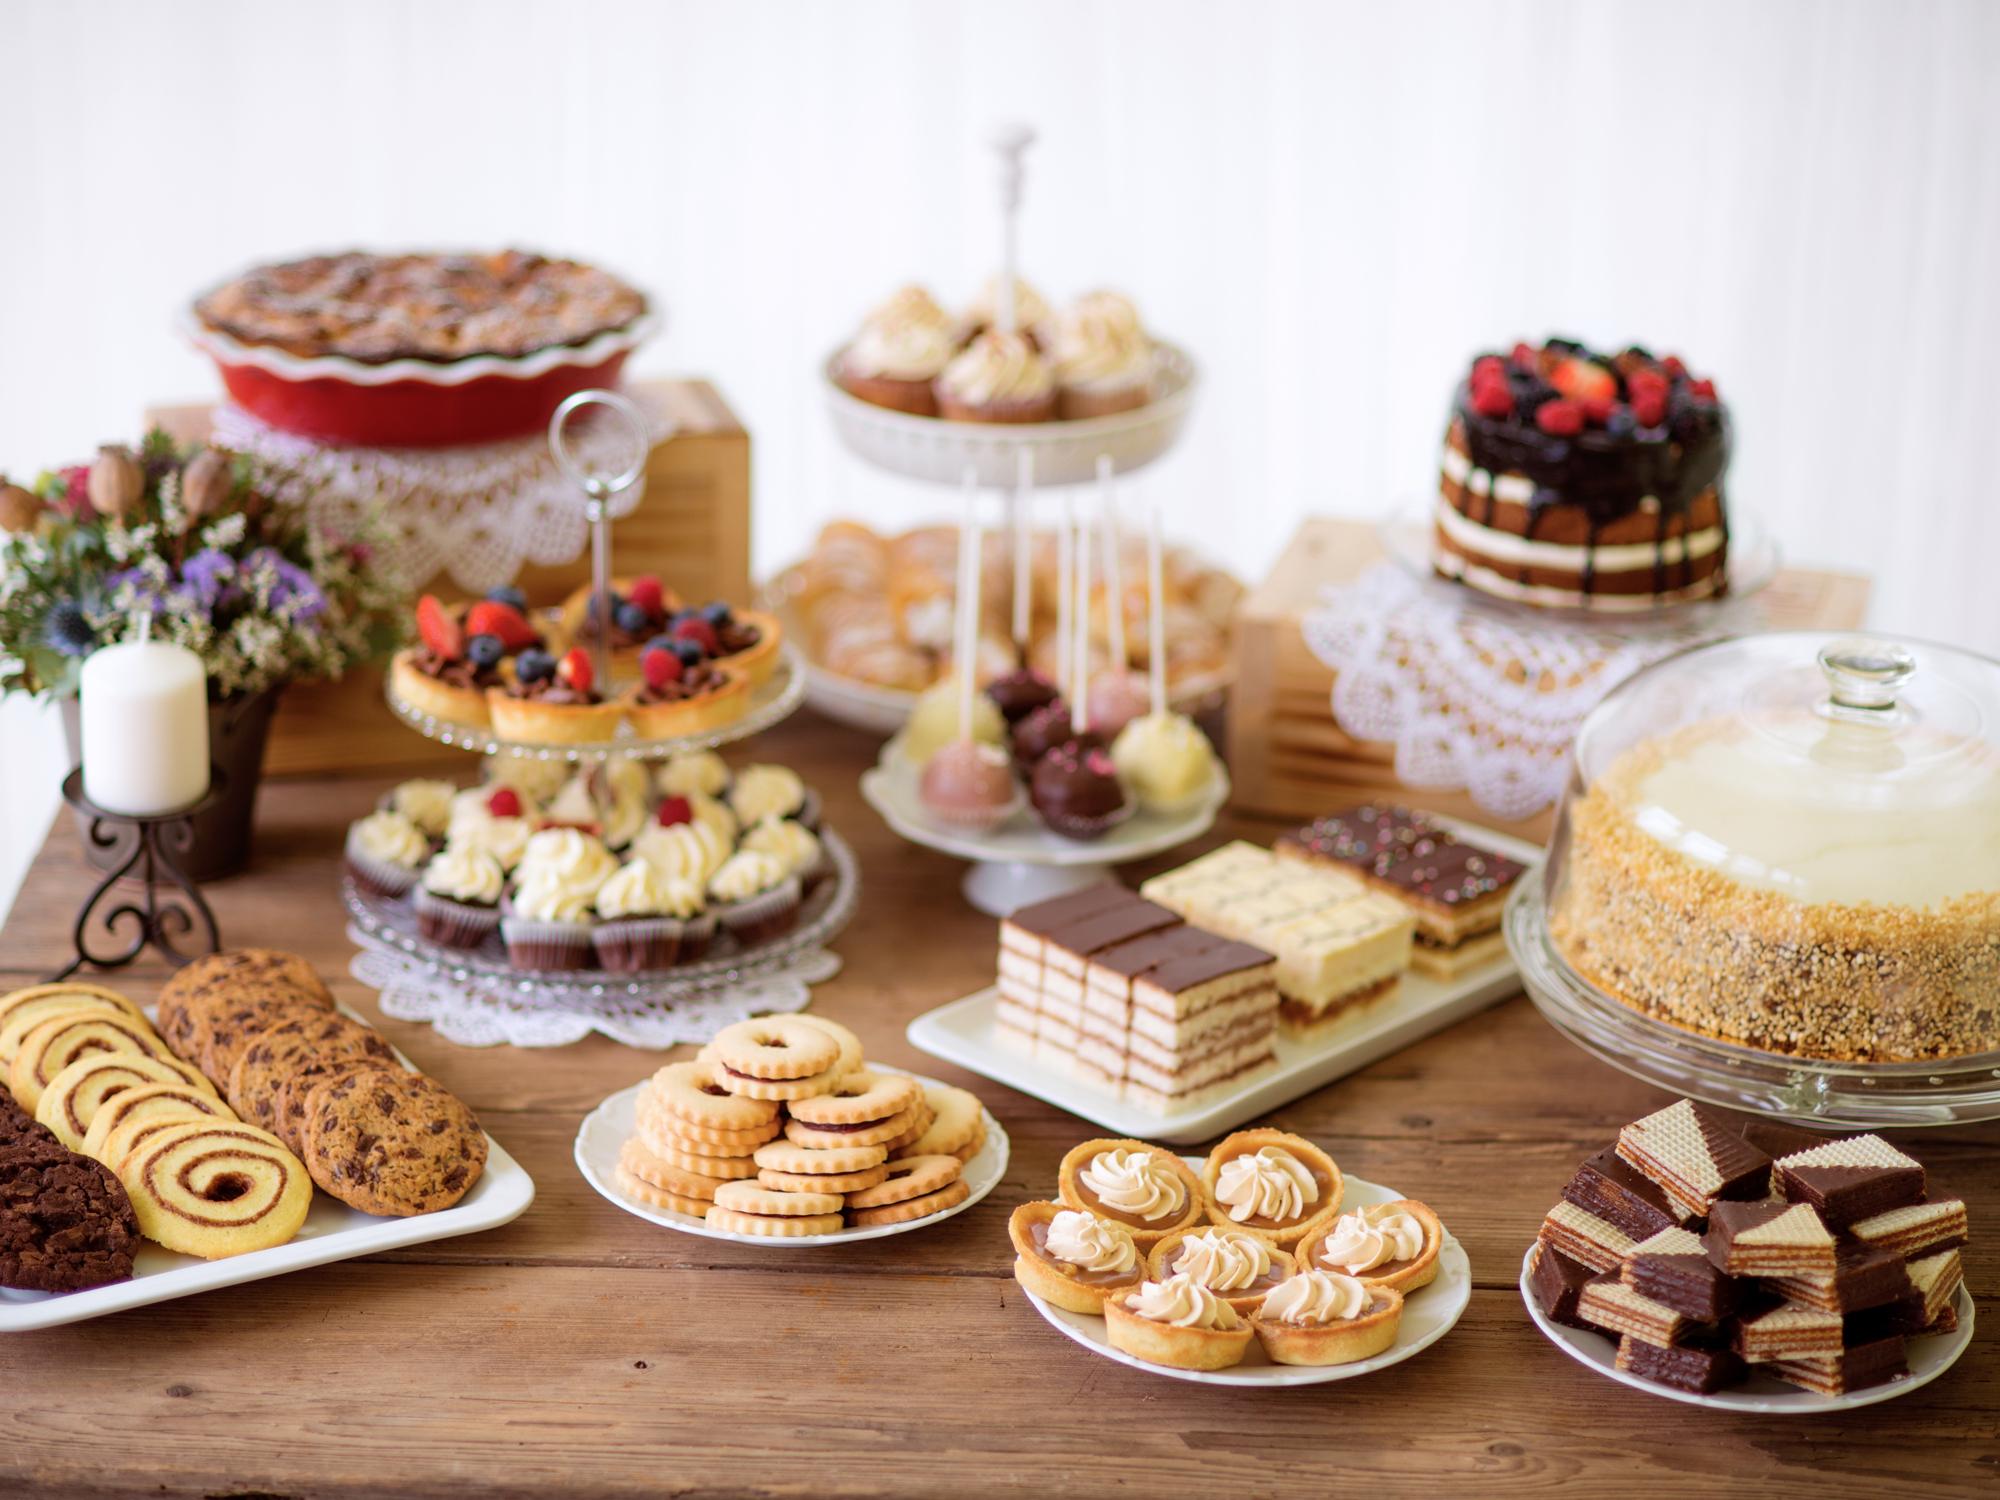 The dessert that offers 4 big health benefits